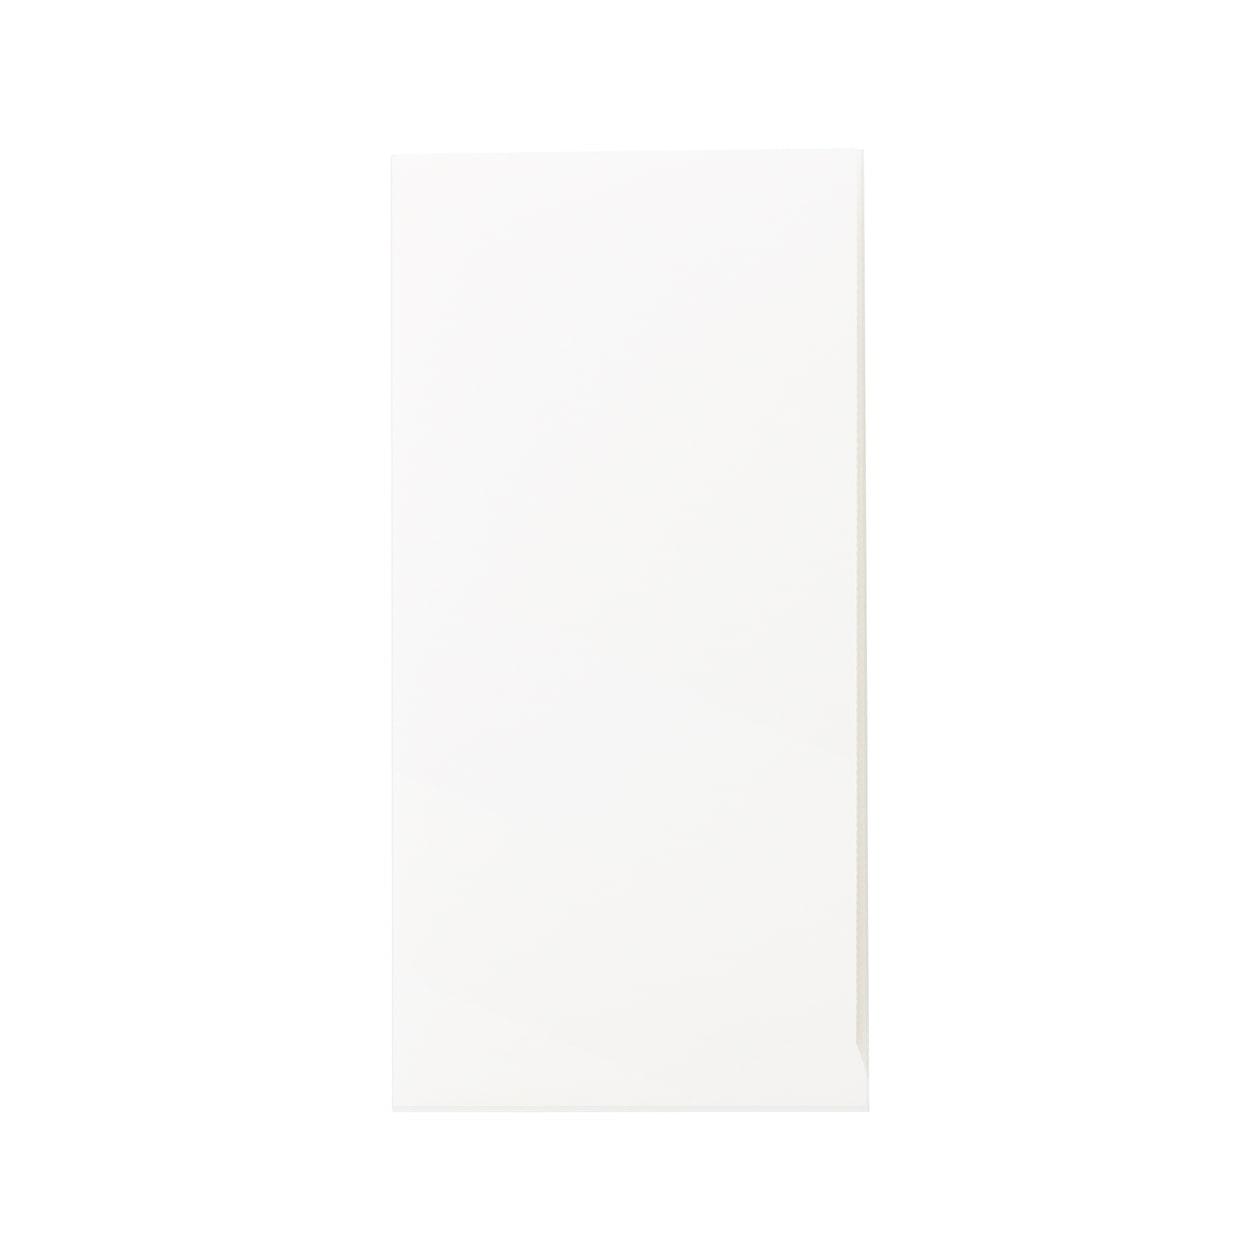 DLファイル HAGURUMA Basic プレインホワイト 100g